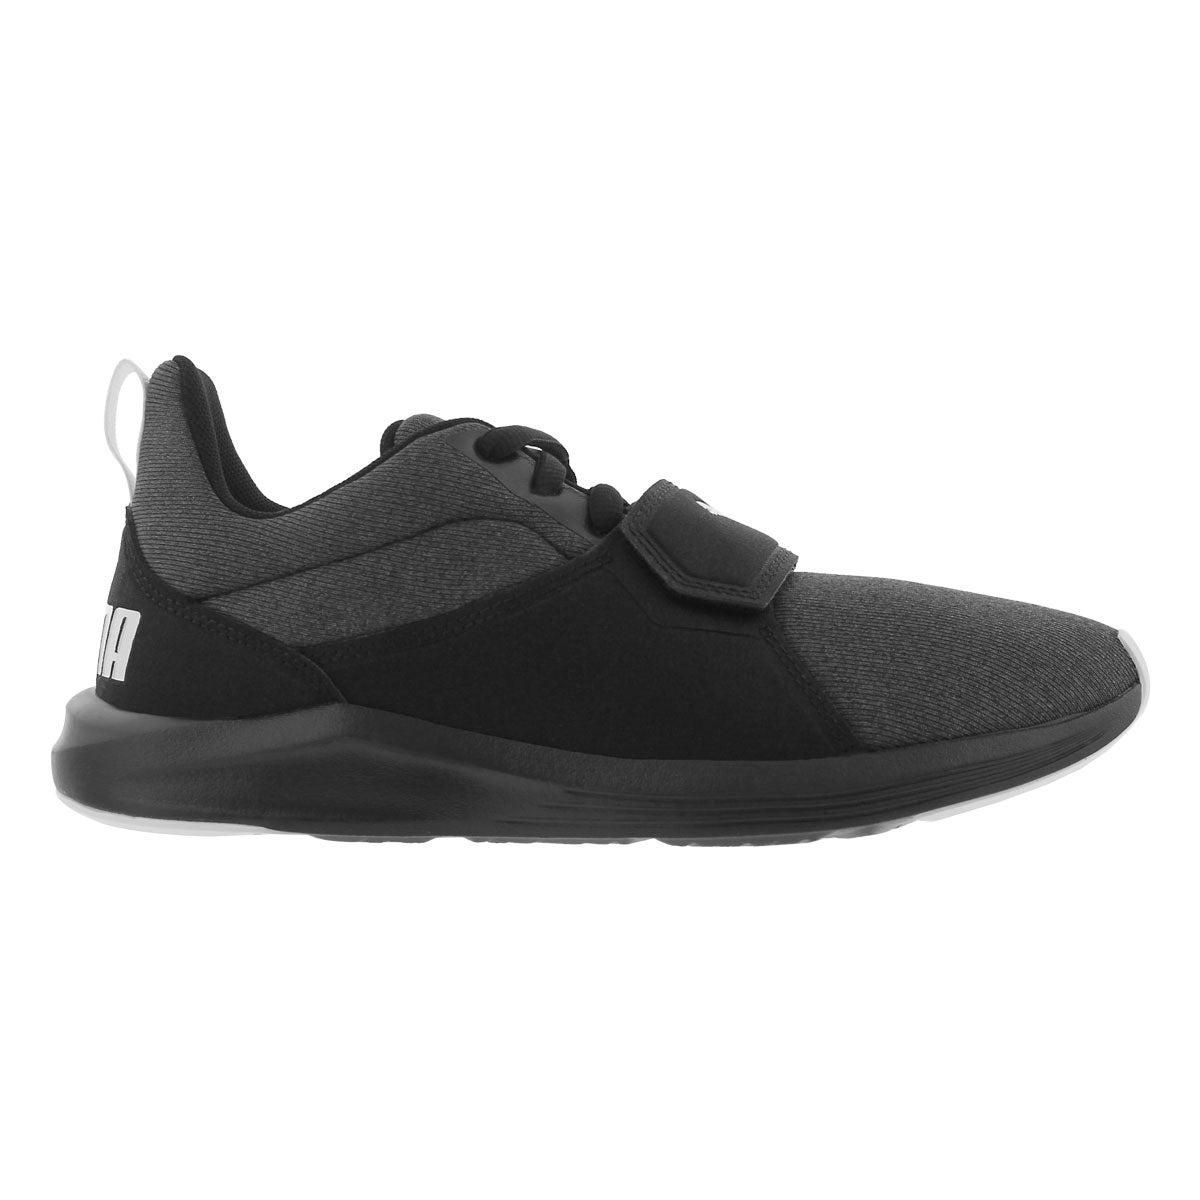 Lds Prodigy black/white sneaker